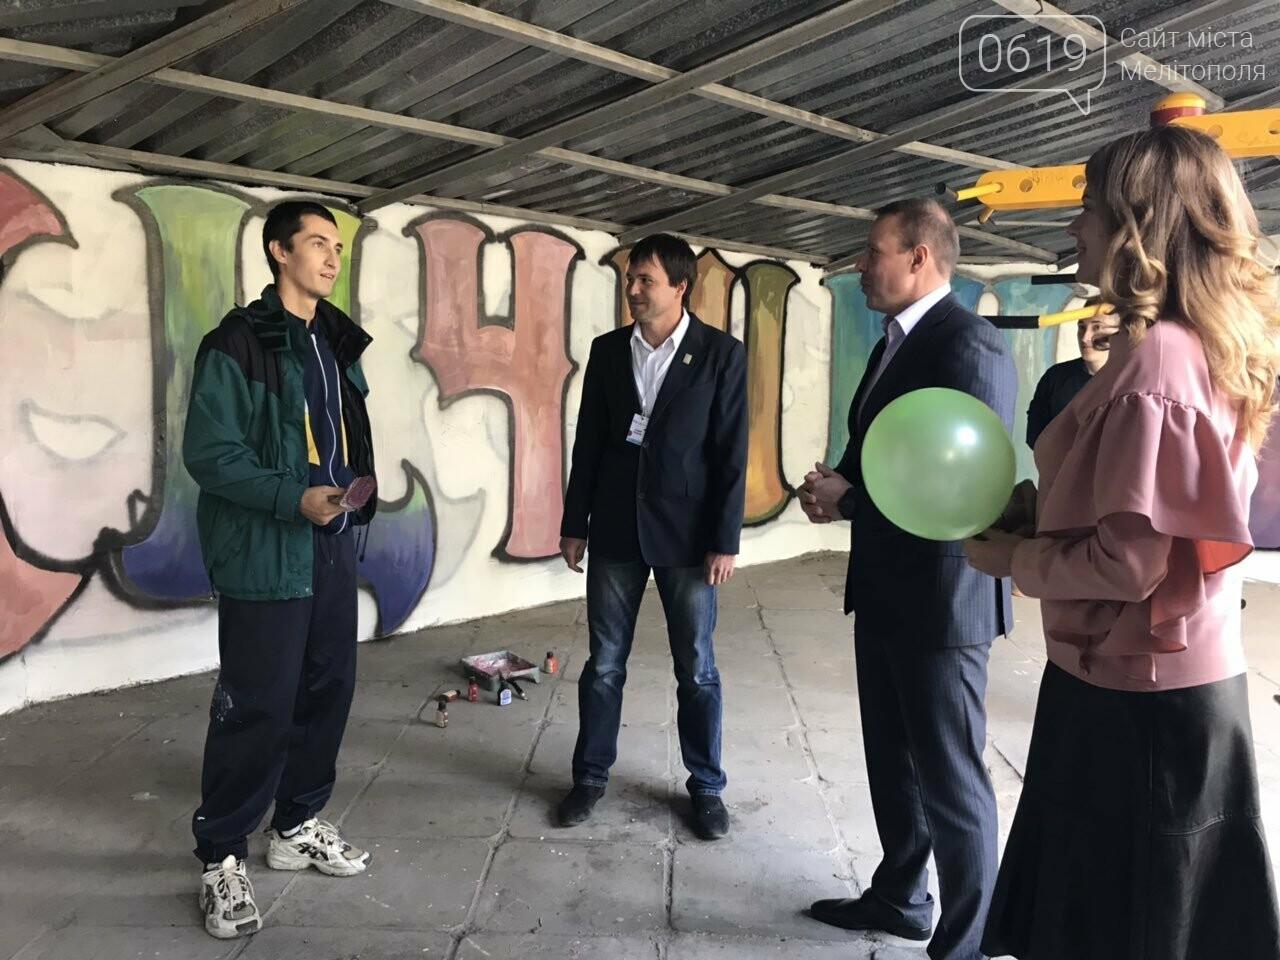 "В Мелитополе состоялось открытие молодежного центра ""People.ua"", фото-7"